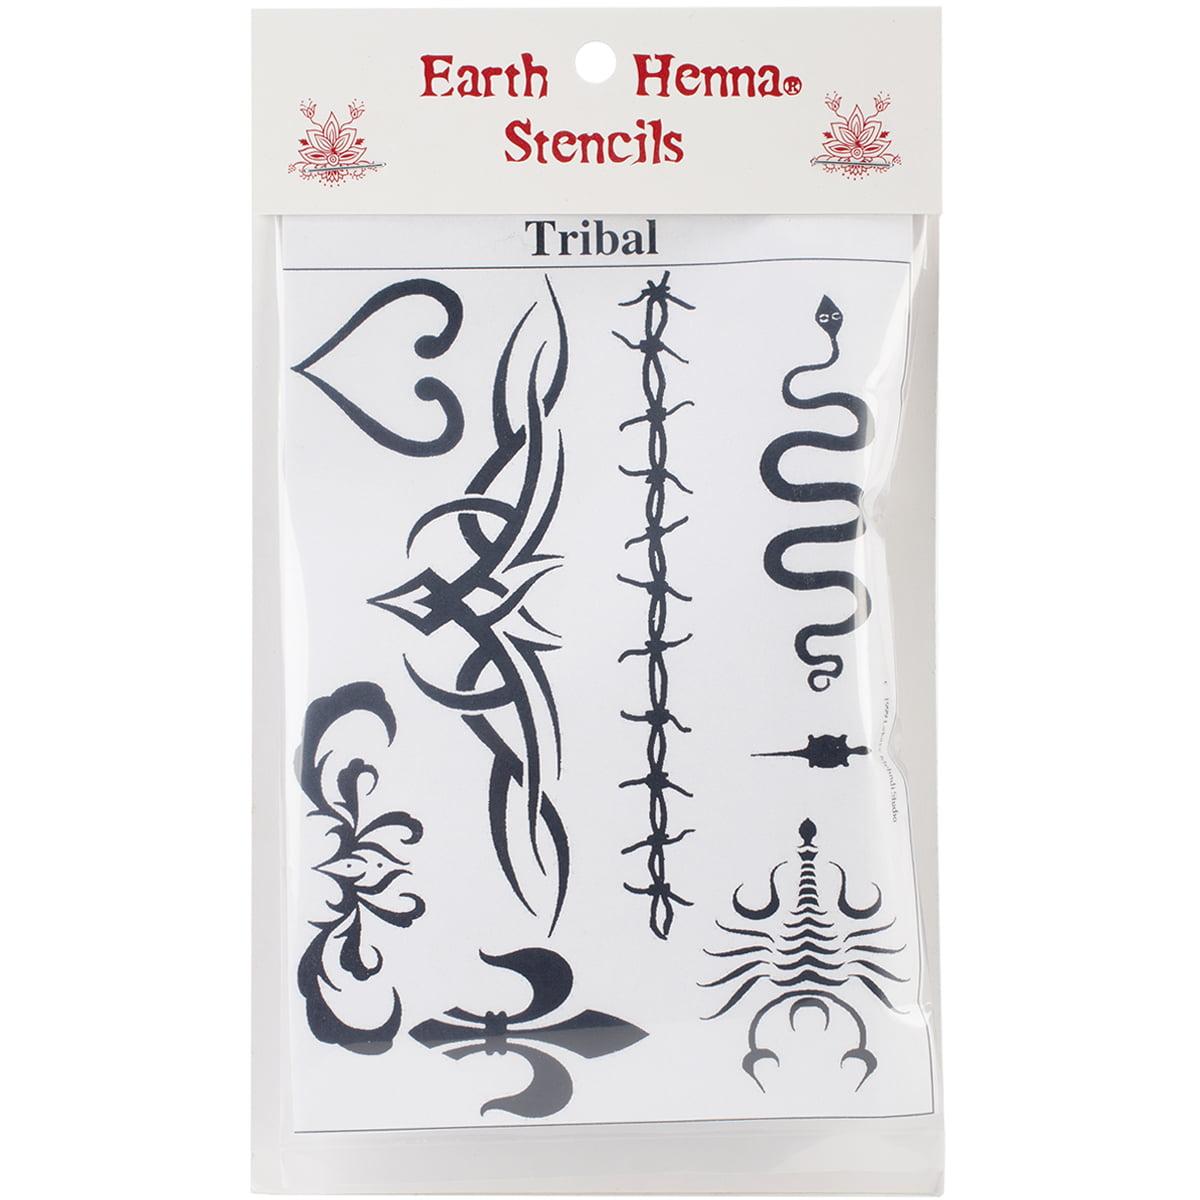 Earth Henna SPLS-TRIBL Stencil Transfer Pack, Tribal Multi-Colored